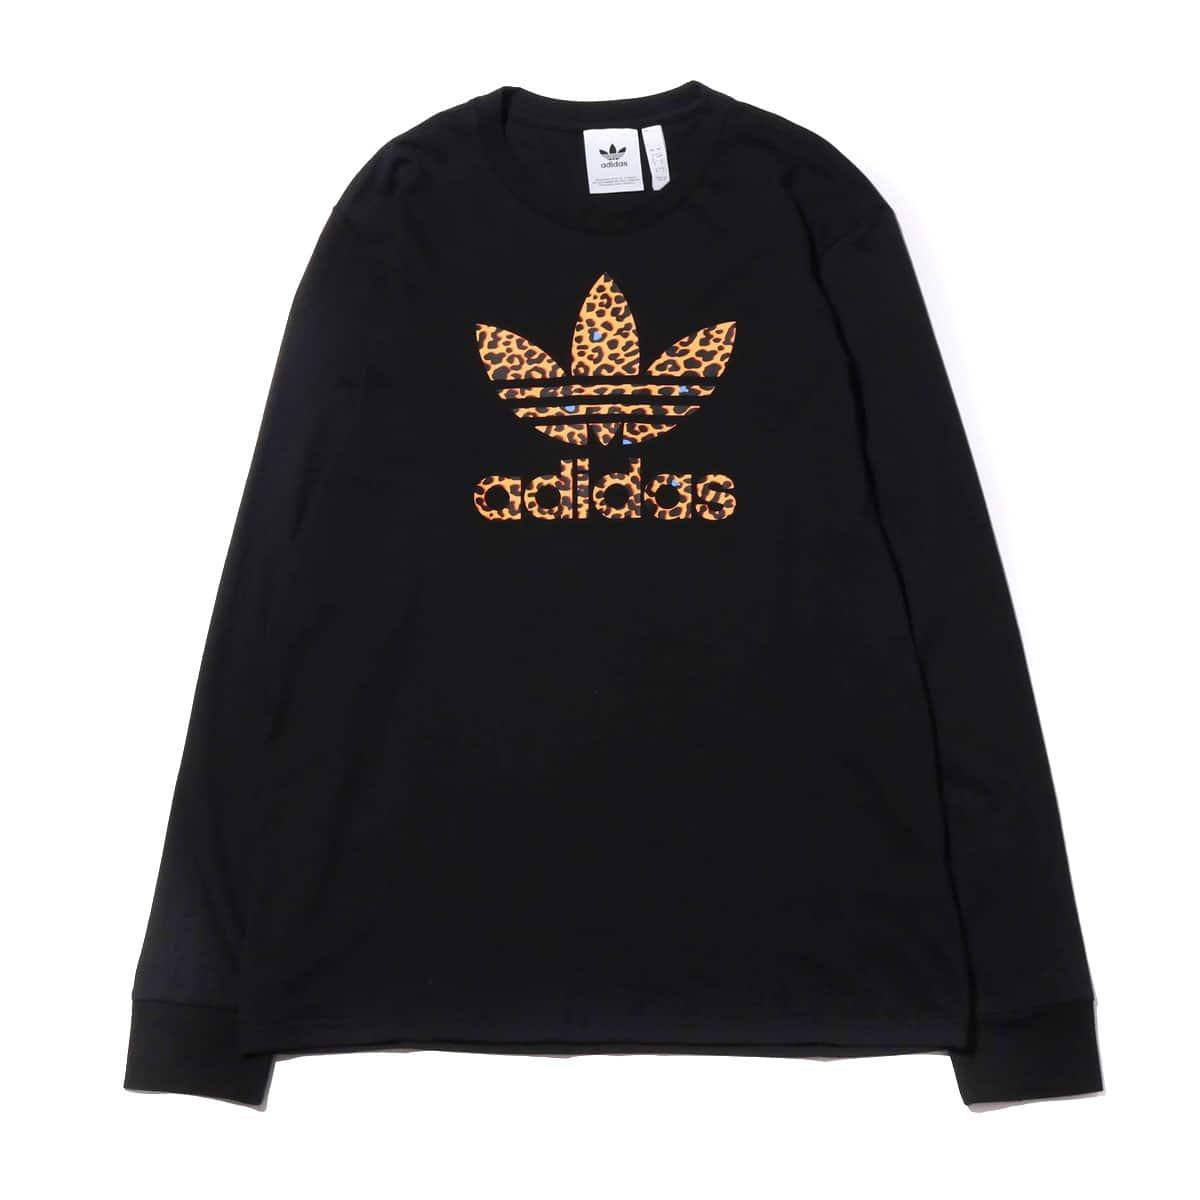 adidas LEPO TREFOIL LS TEE BLACK 19FW-I_photo_large